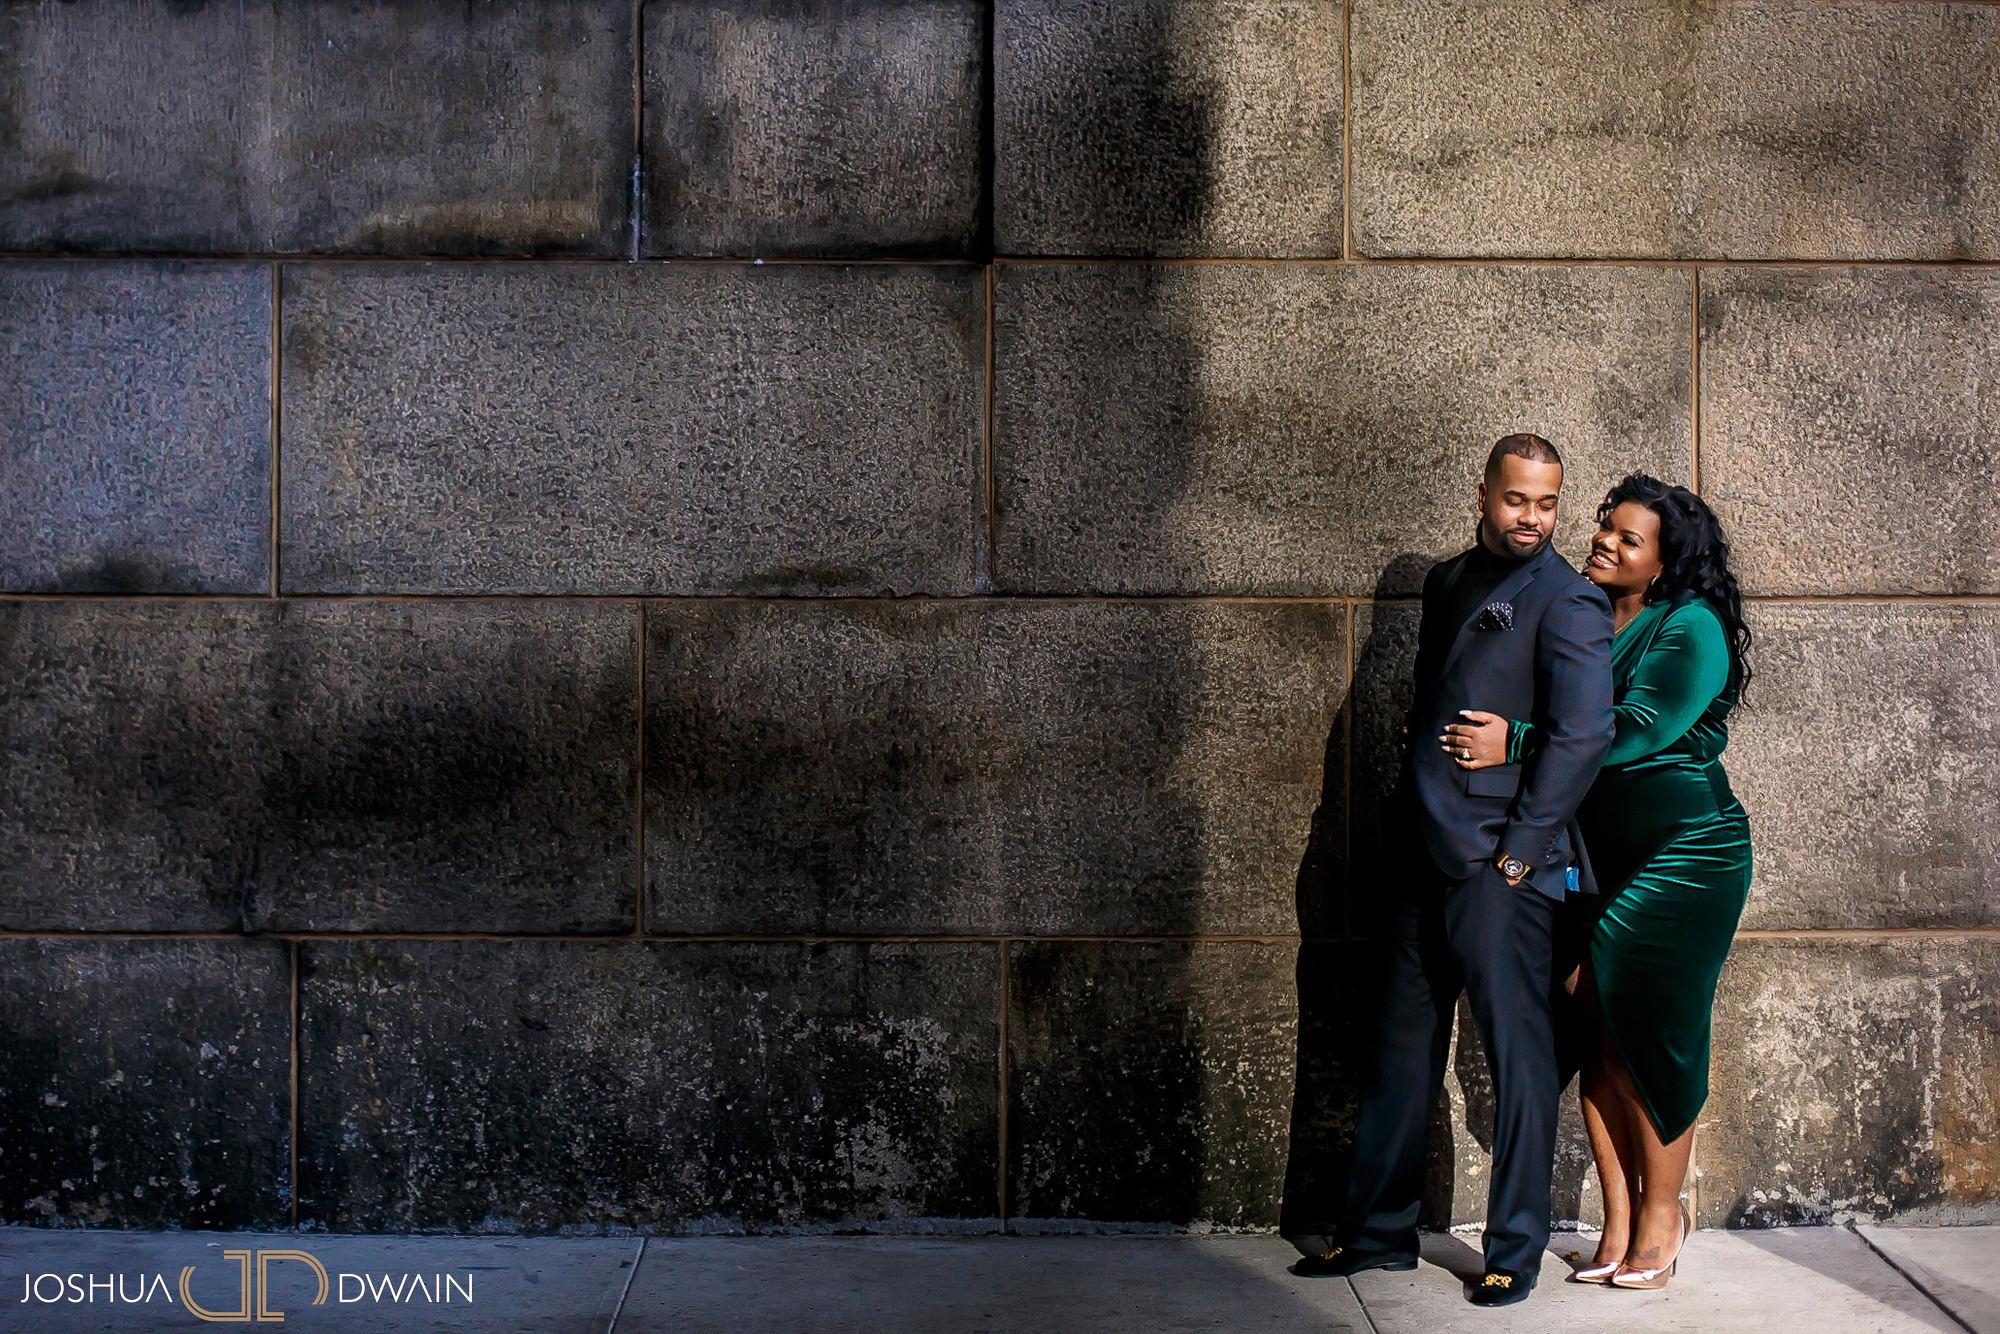 melisa-lloyd-003-brooklyn-dumbo-engagement-photos-matthew-ellis-joshua-dwain